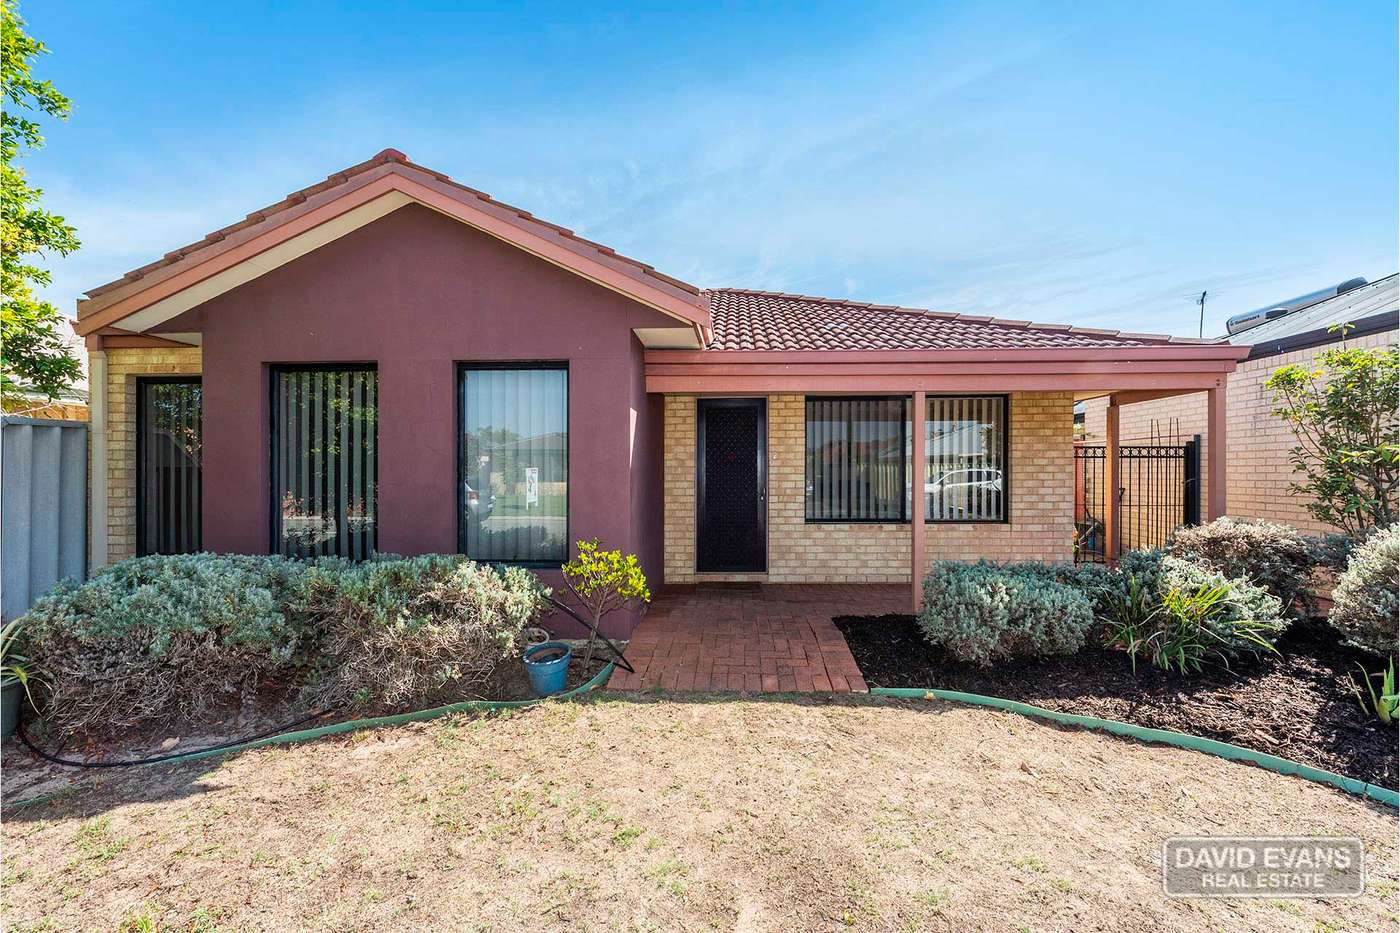 Main view of Homely house listing, 55 Zaragoza Drive, Port Kennedy, WA 6172